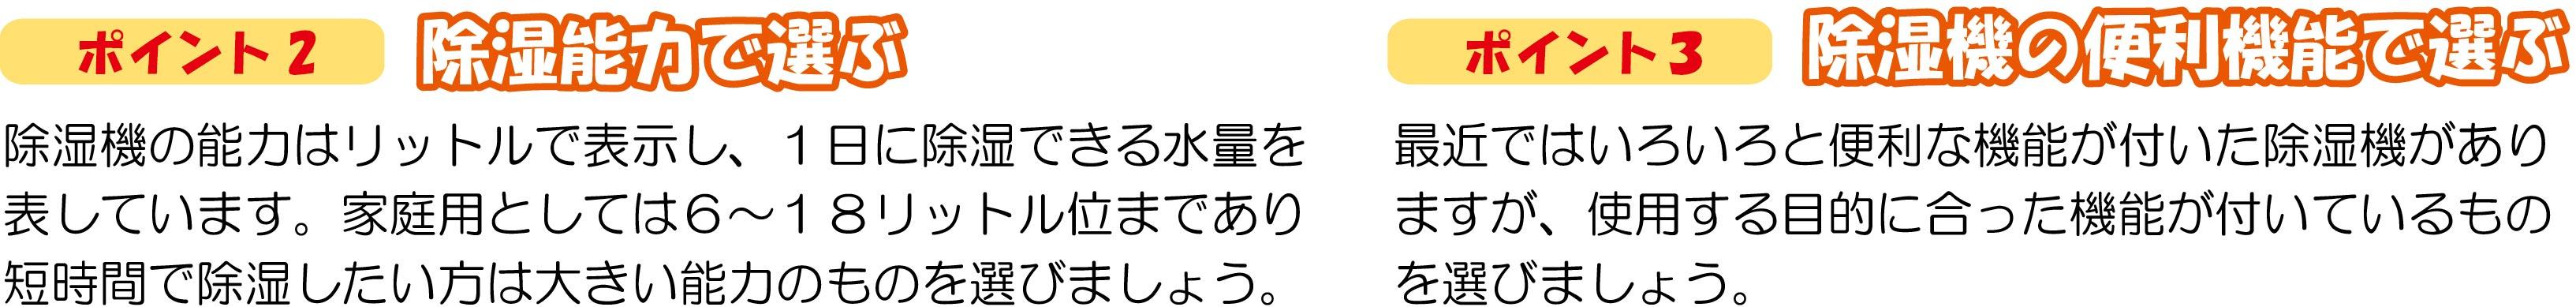 KuraSi-natu-sin86-16.jpg